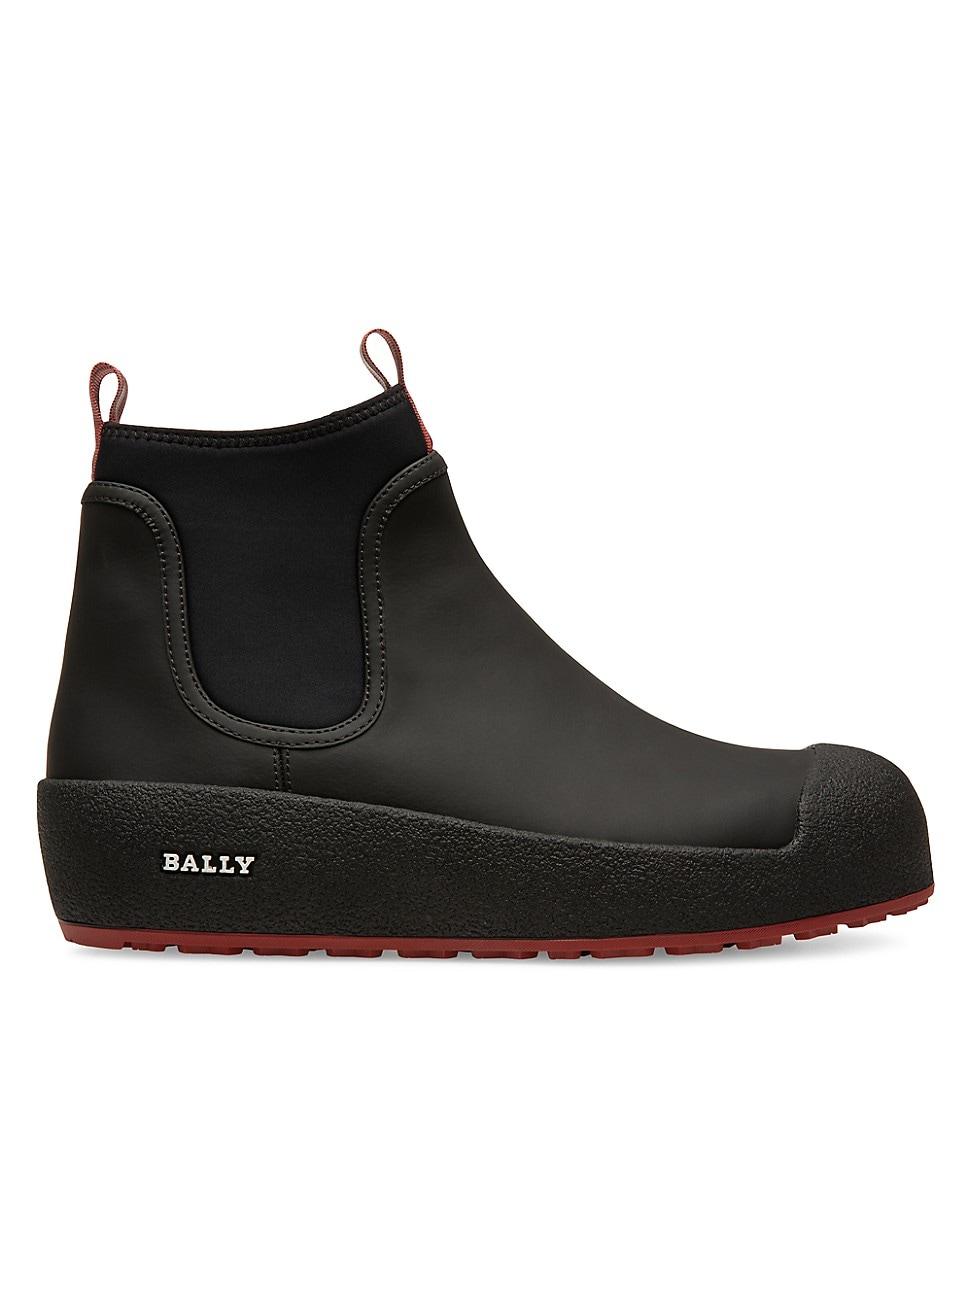 Bally Men's Cubrid Chelsea Boots In Black